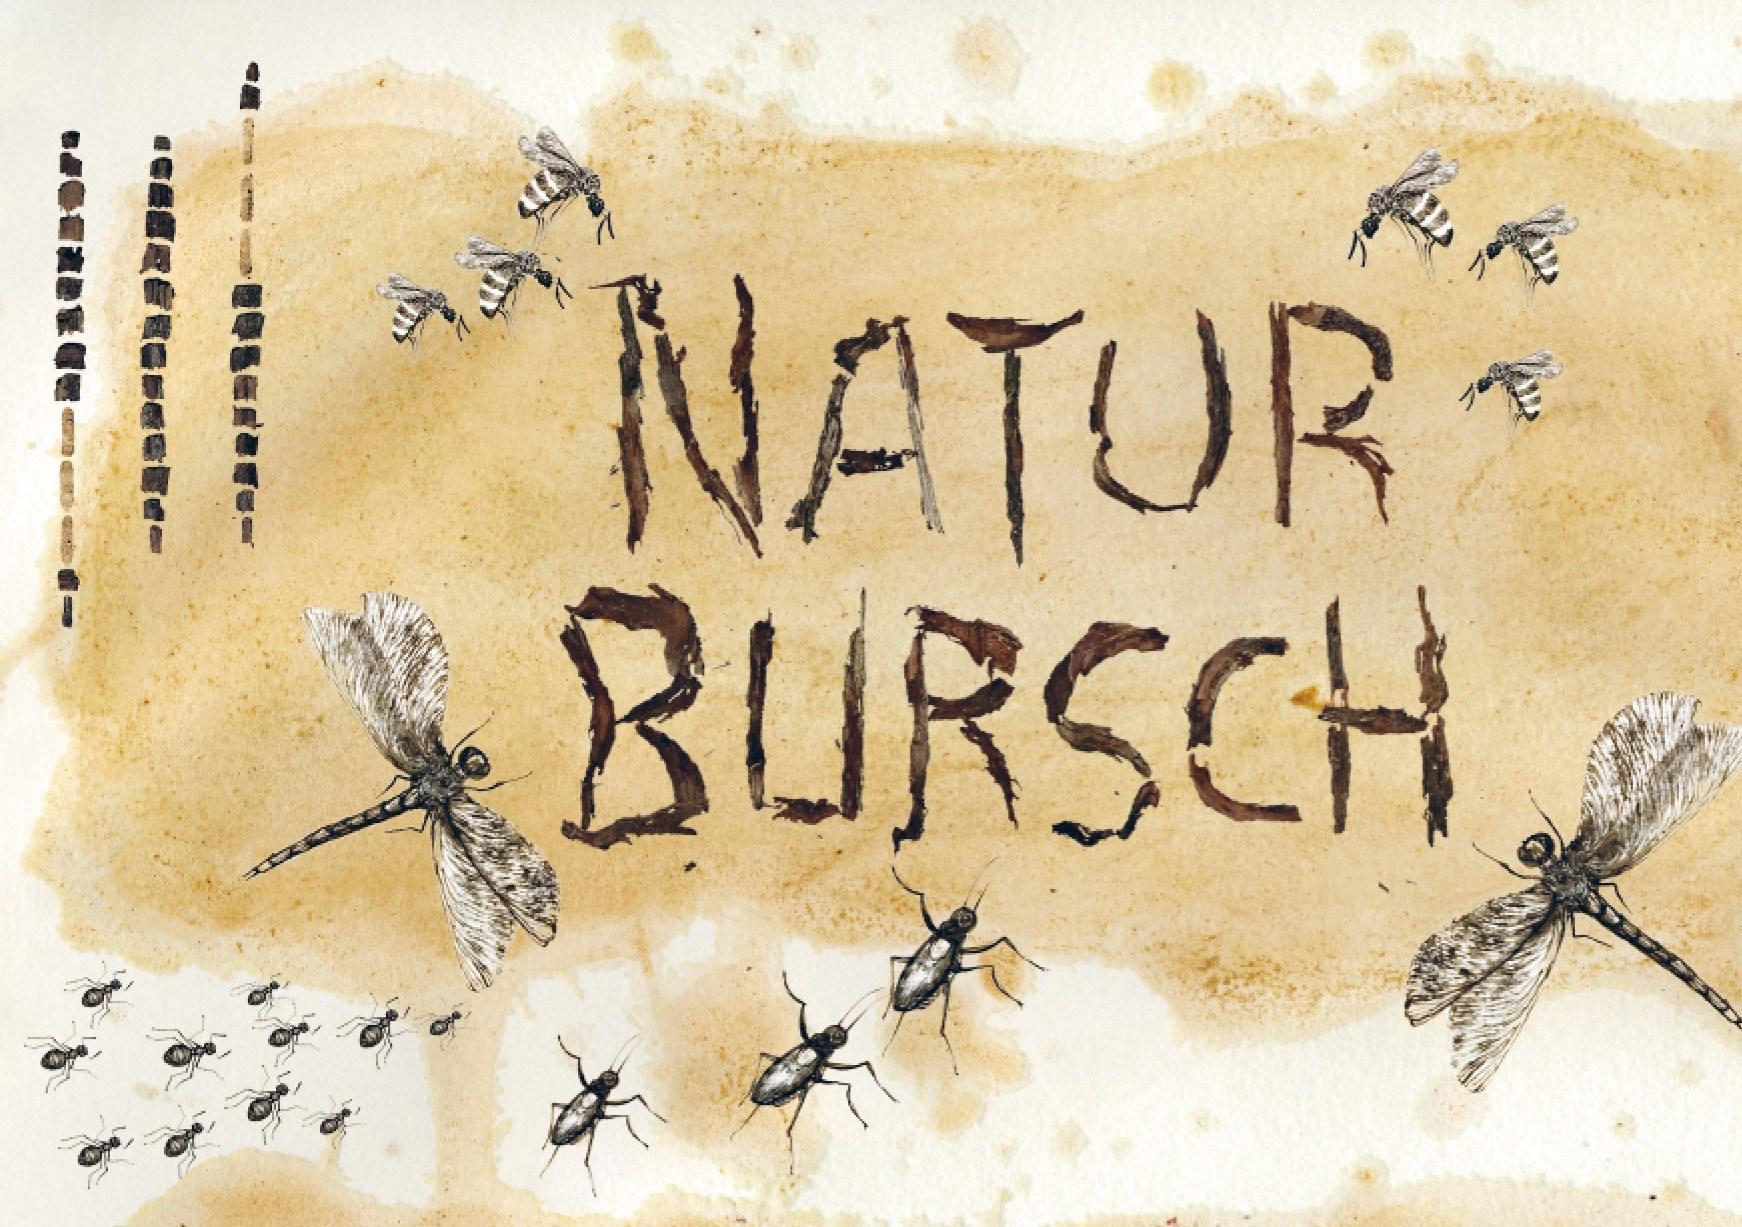 Naturbursch - Bio-Weißweincuvée